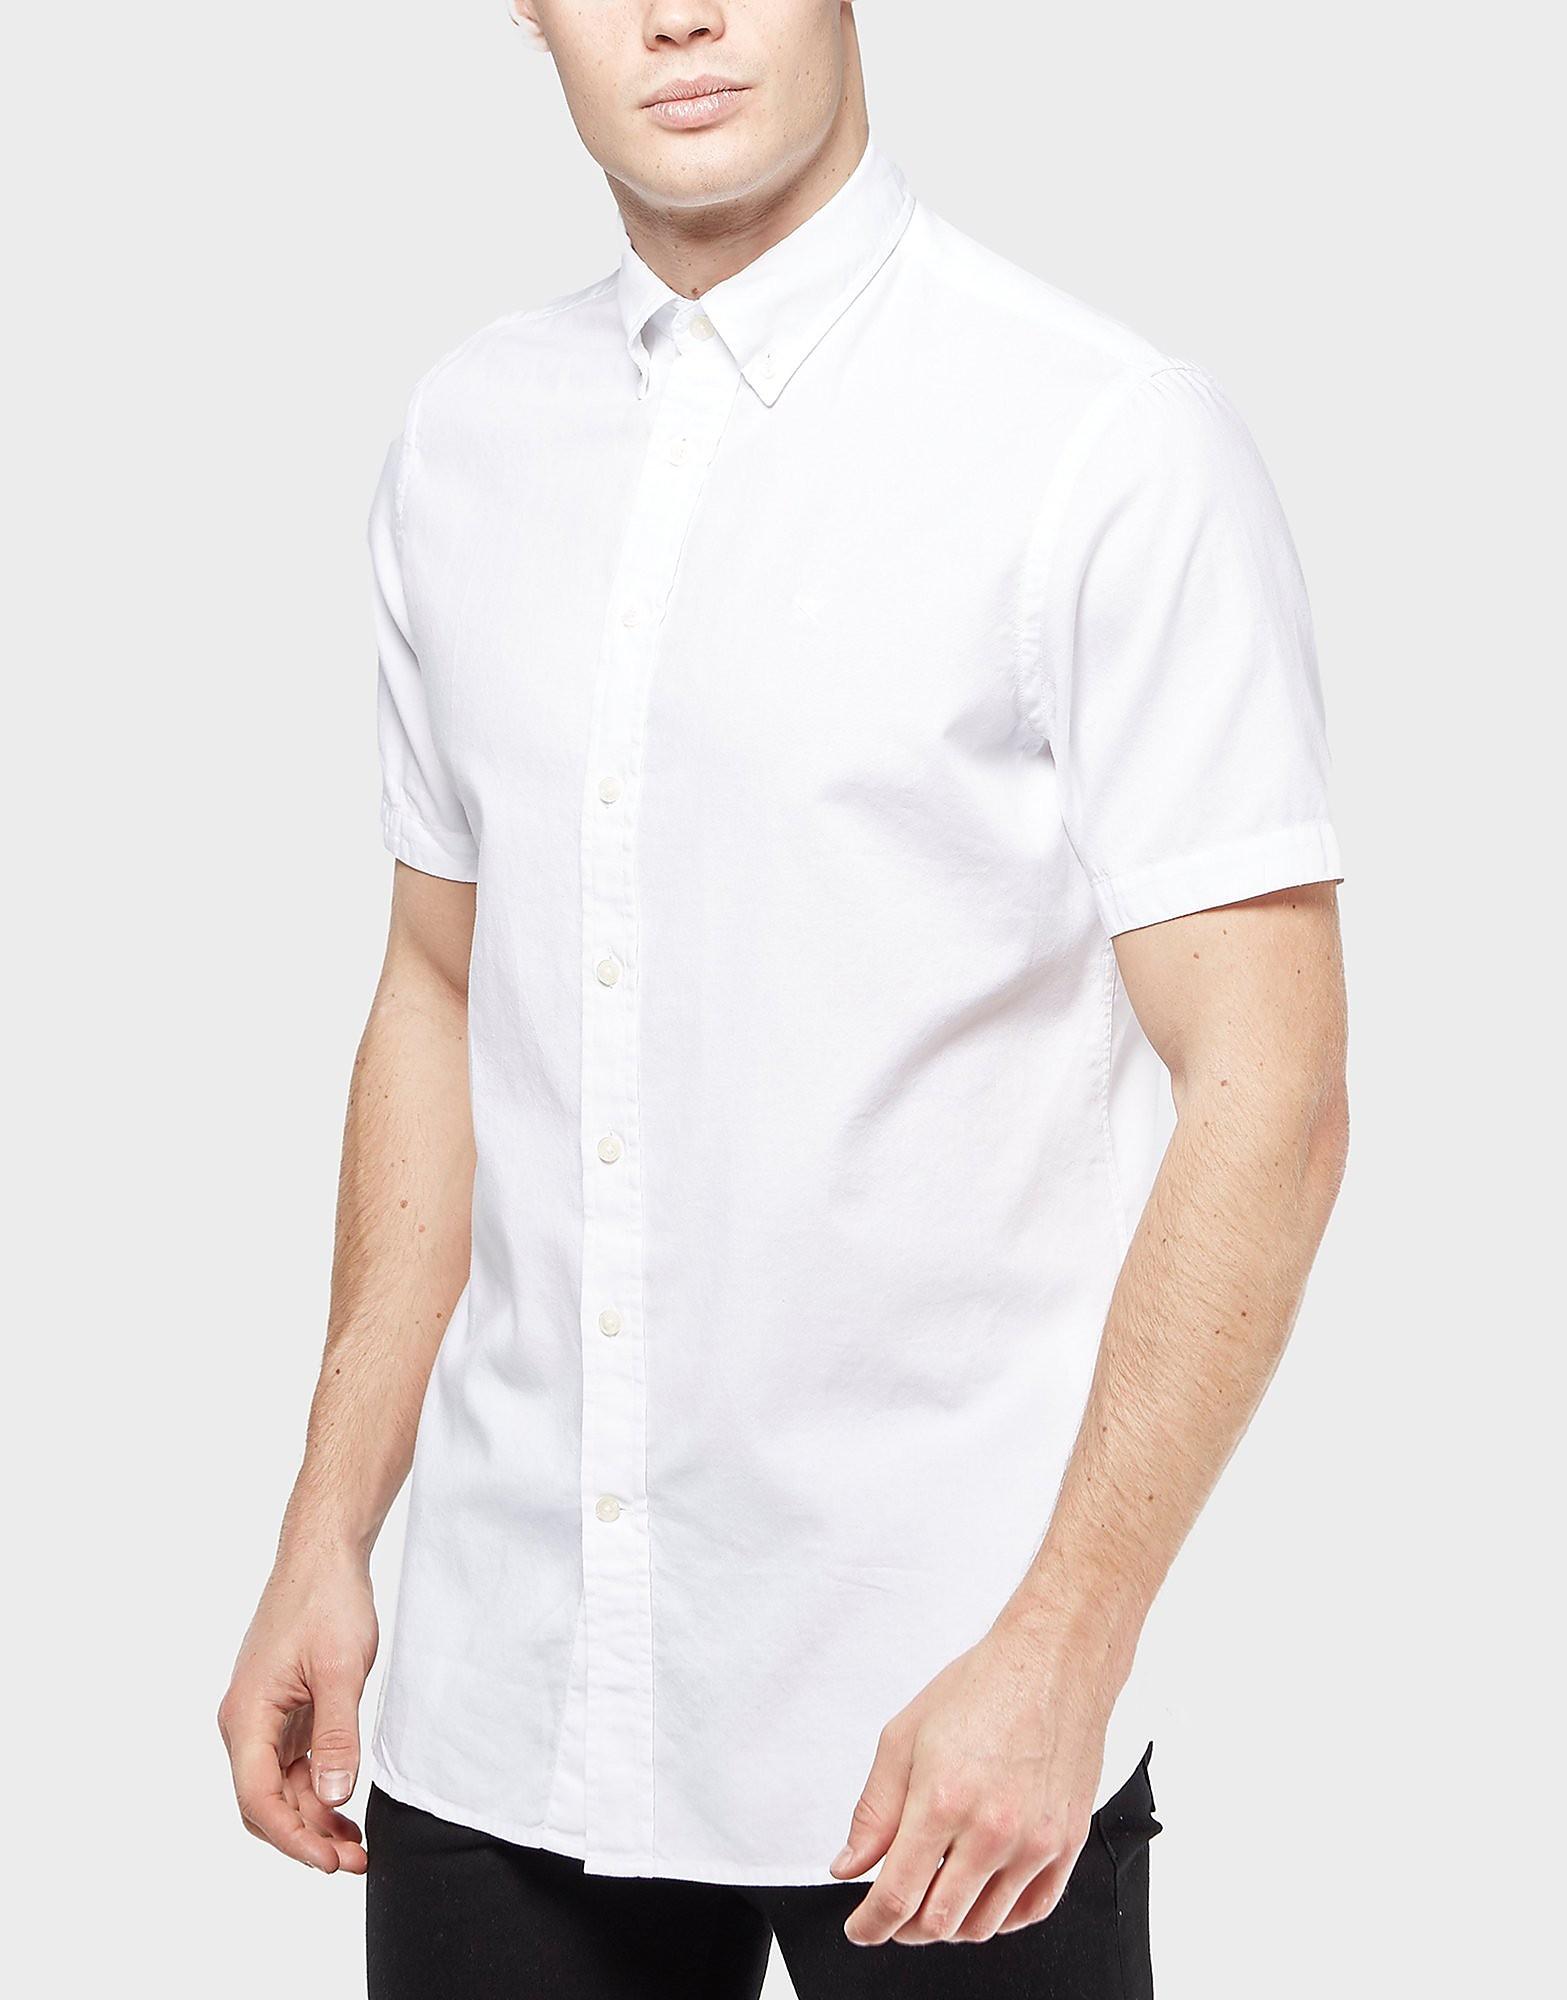 HACKETT Oxford Shirt